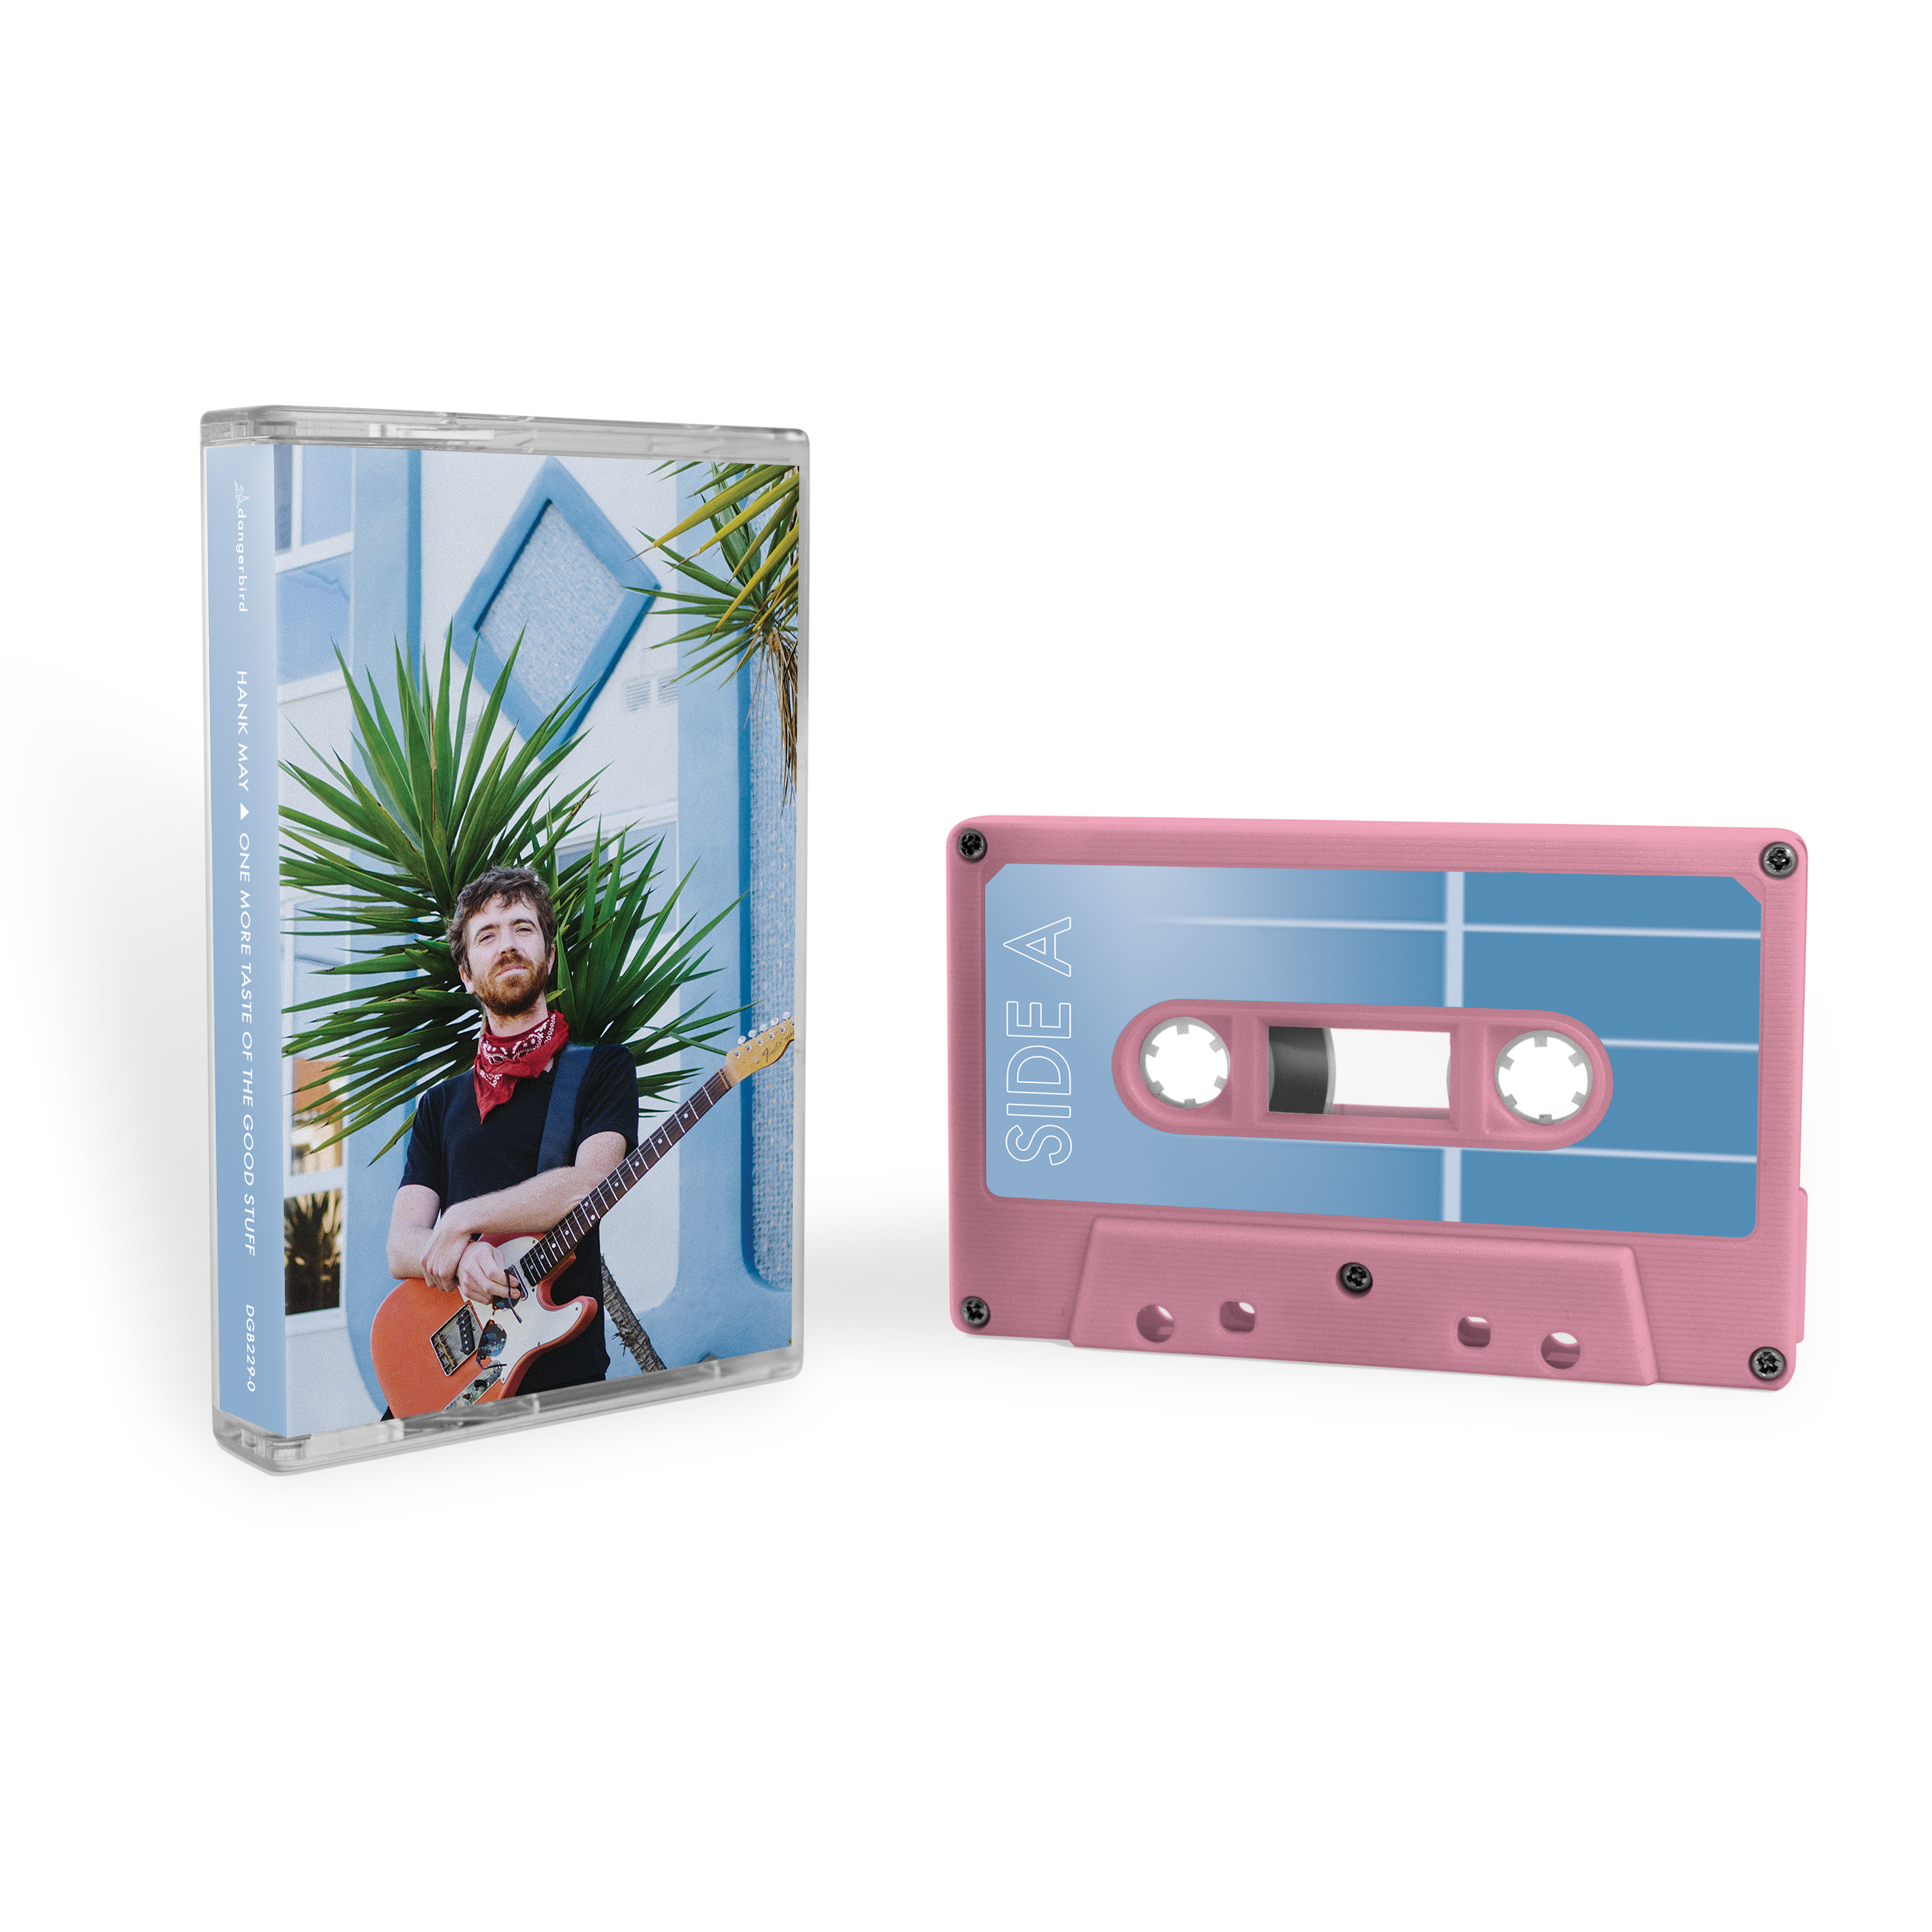 Hank May - One More Taste of the Good Stuff - Cassette + Shirt Bundle